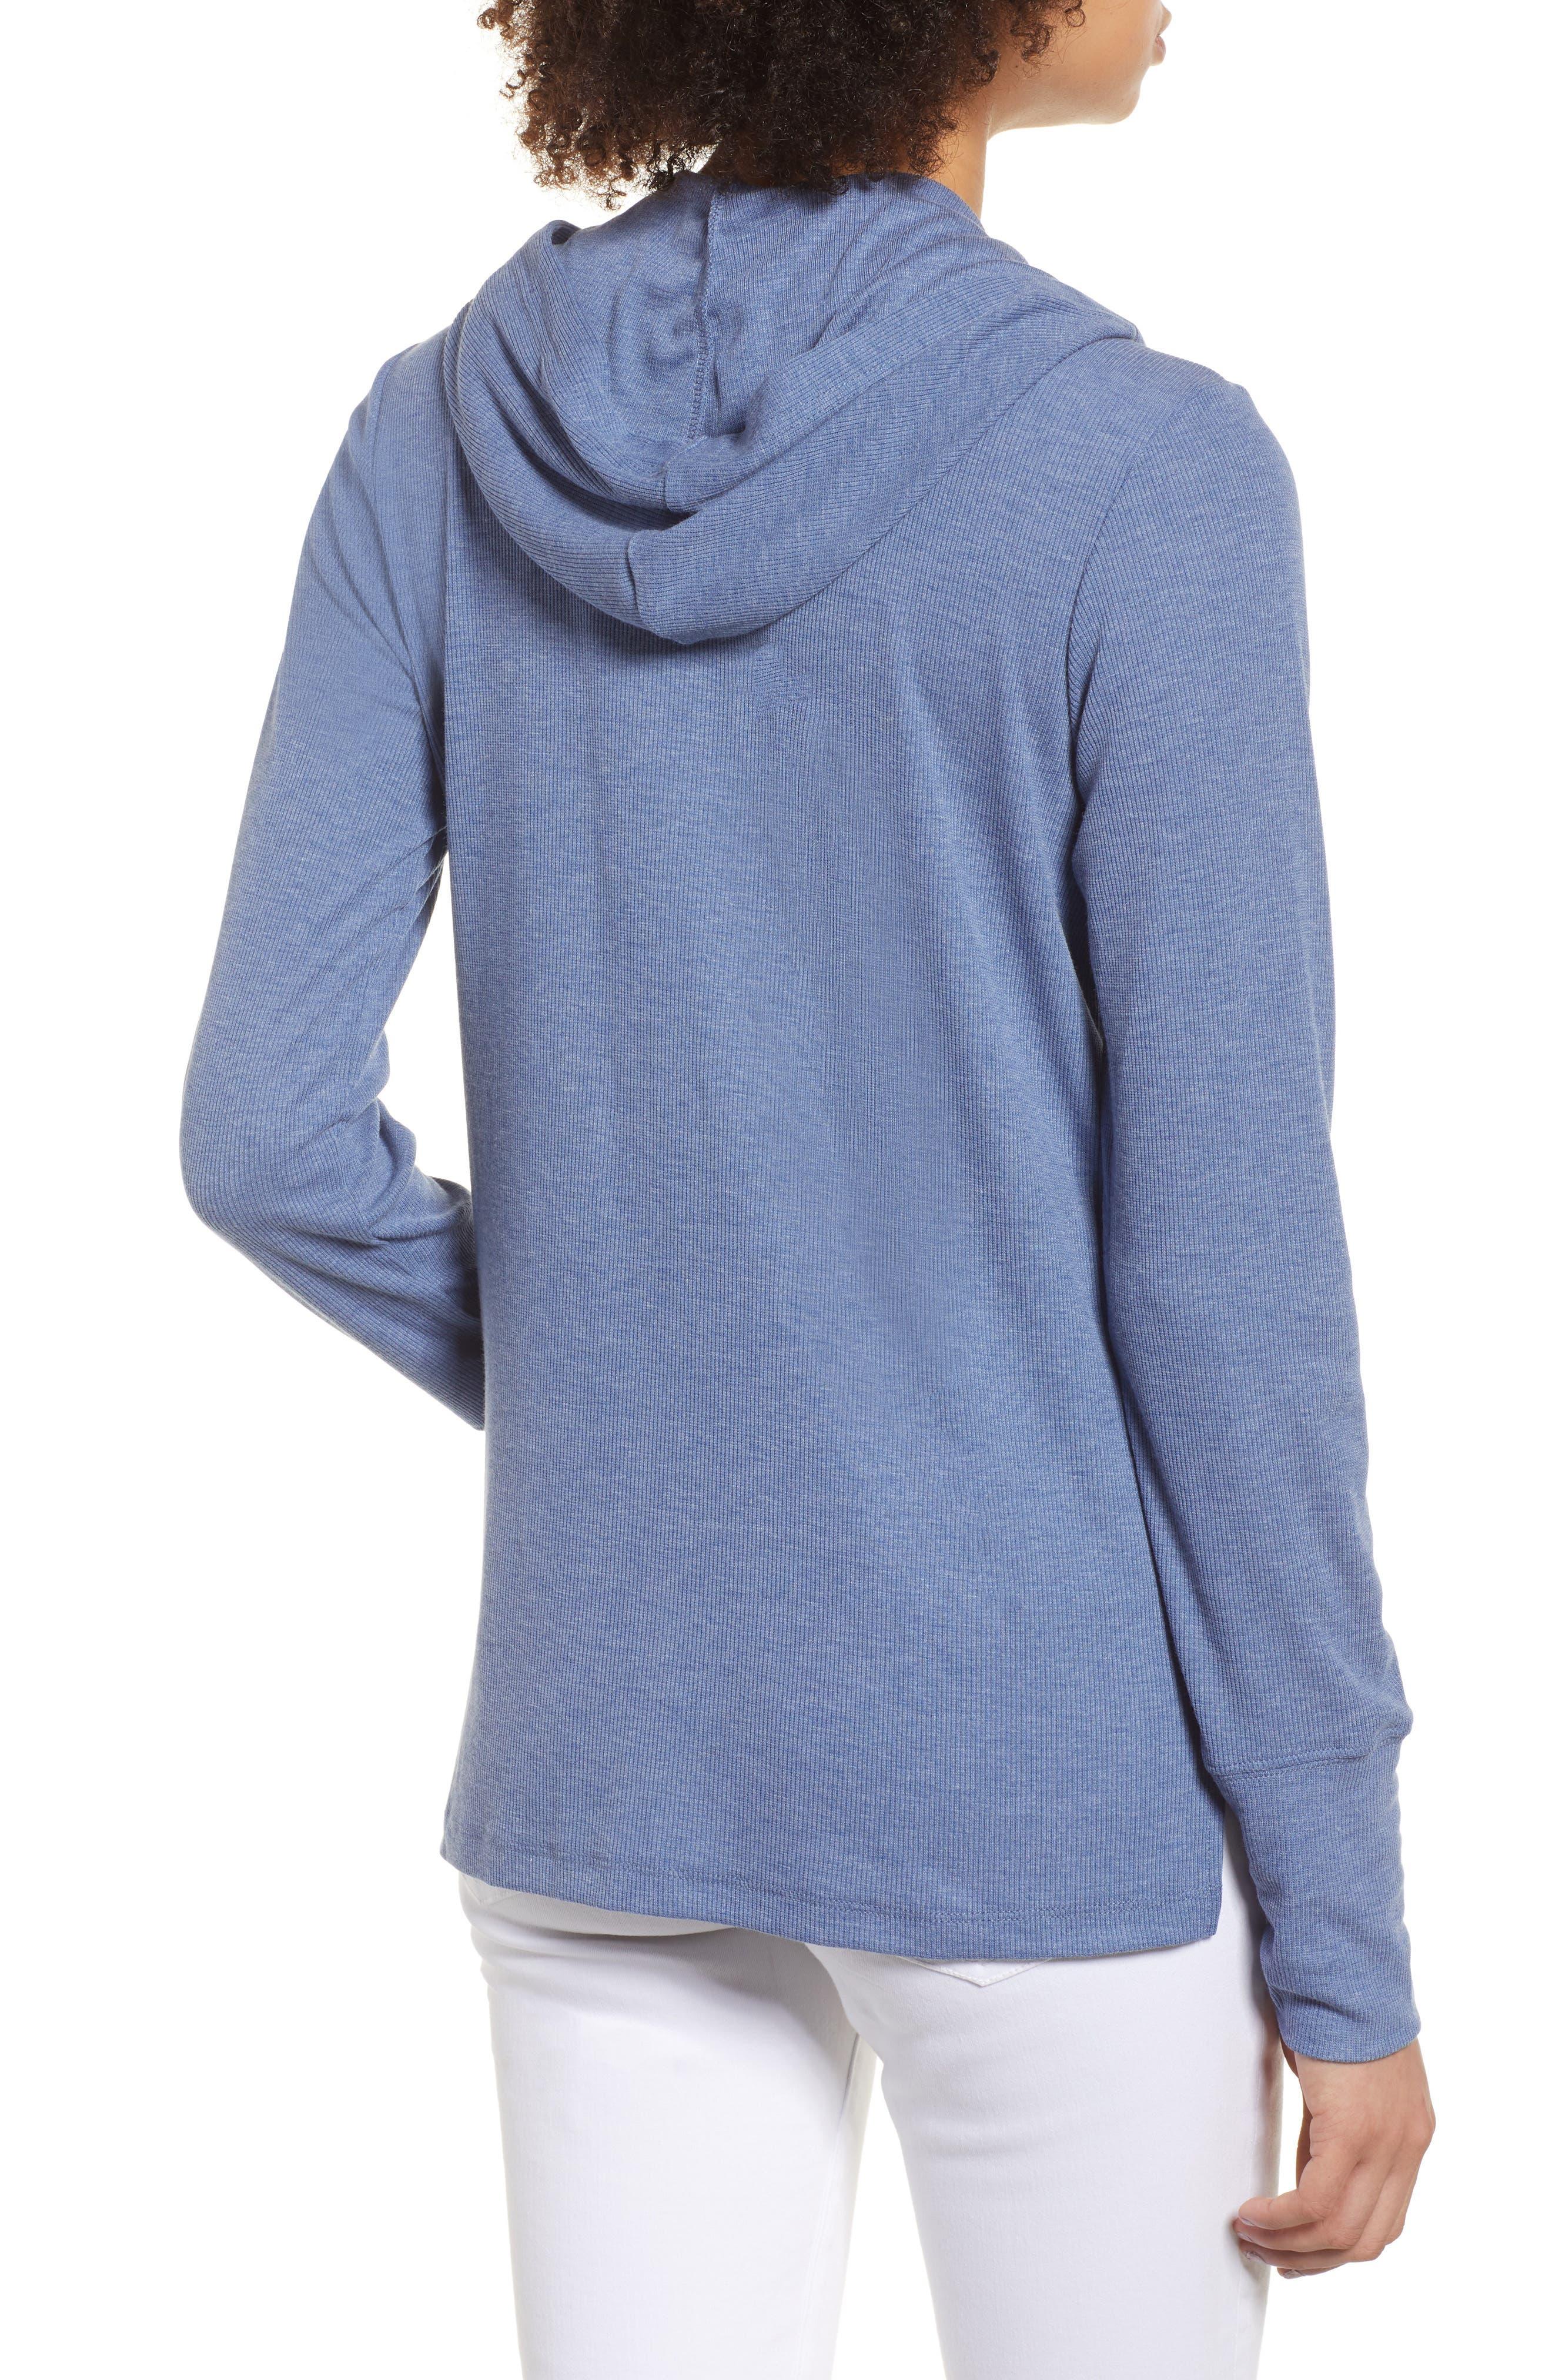 Campbell Kansas City Royals Rib Knit Hooded Top,                             Alternate thumbnail 2, color,                             Bleacher Blue